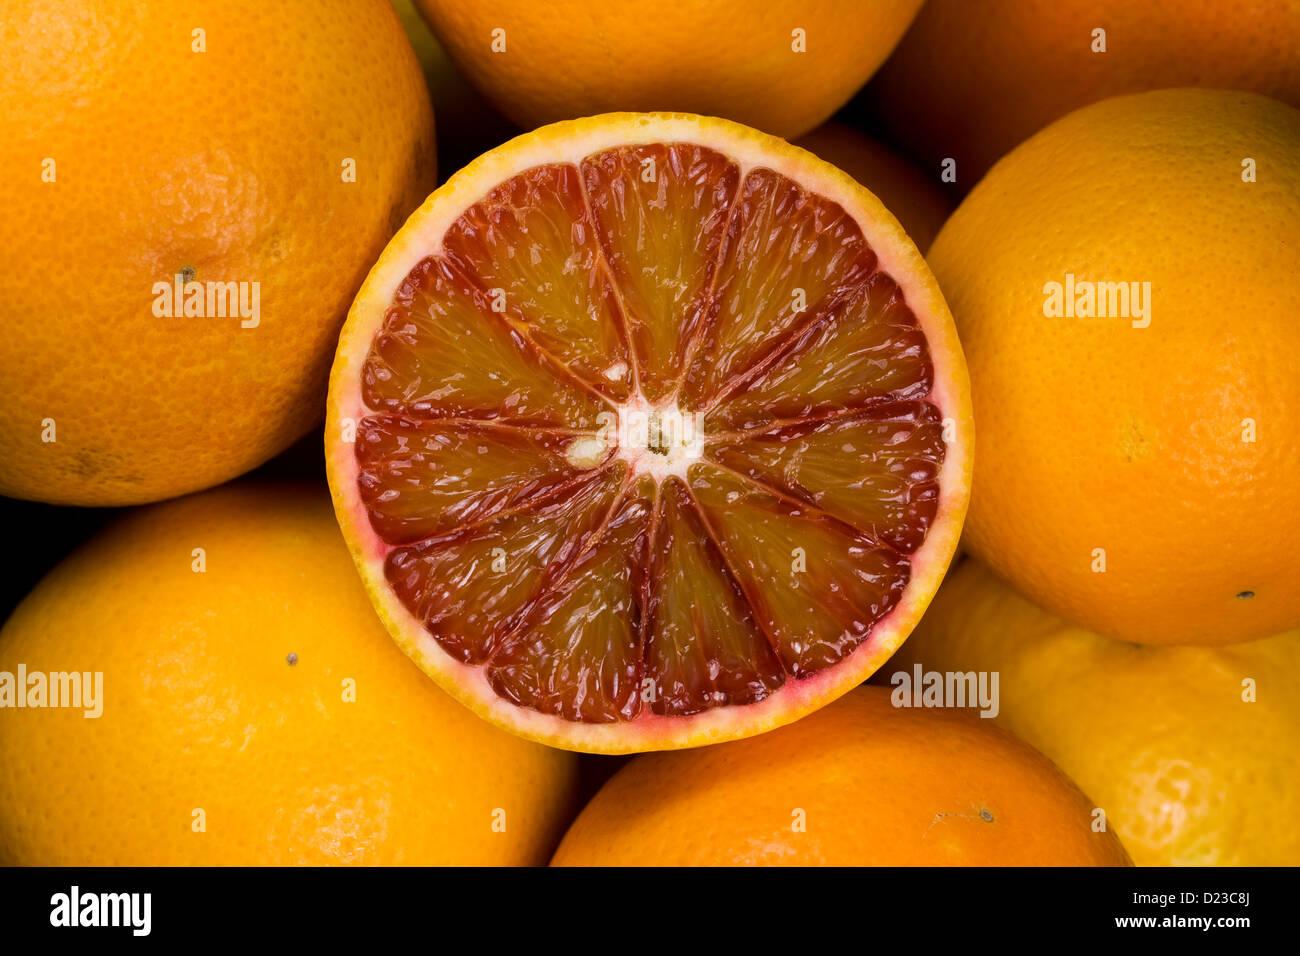 Citrus x sinenesis. Blood Oranges in a fruit bowl. - Stock Image